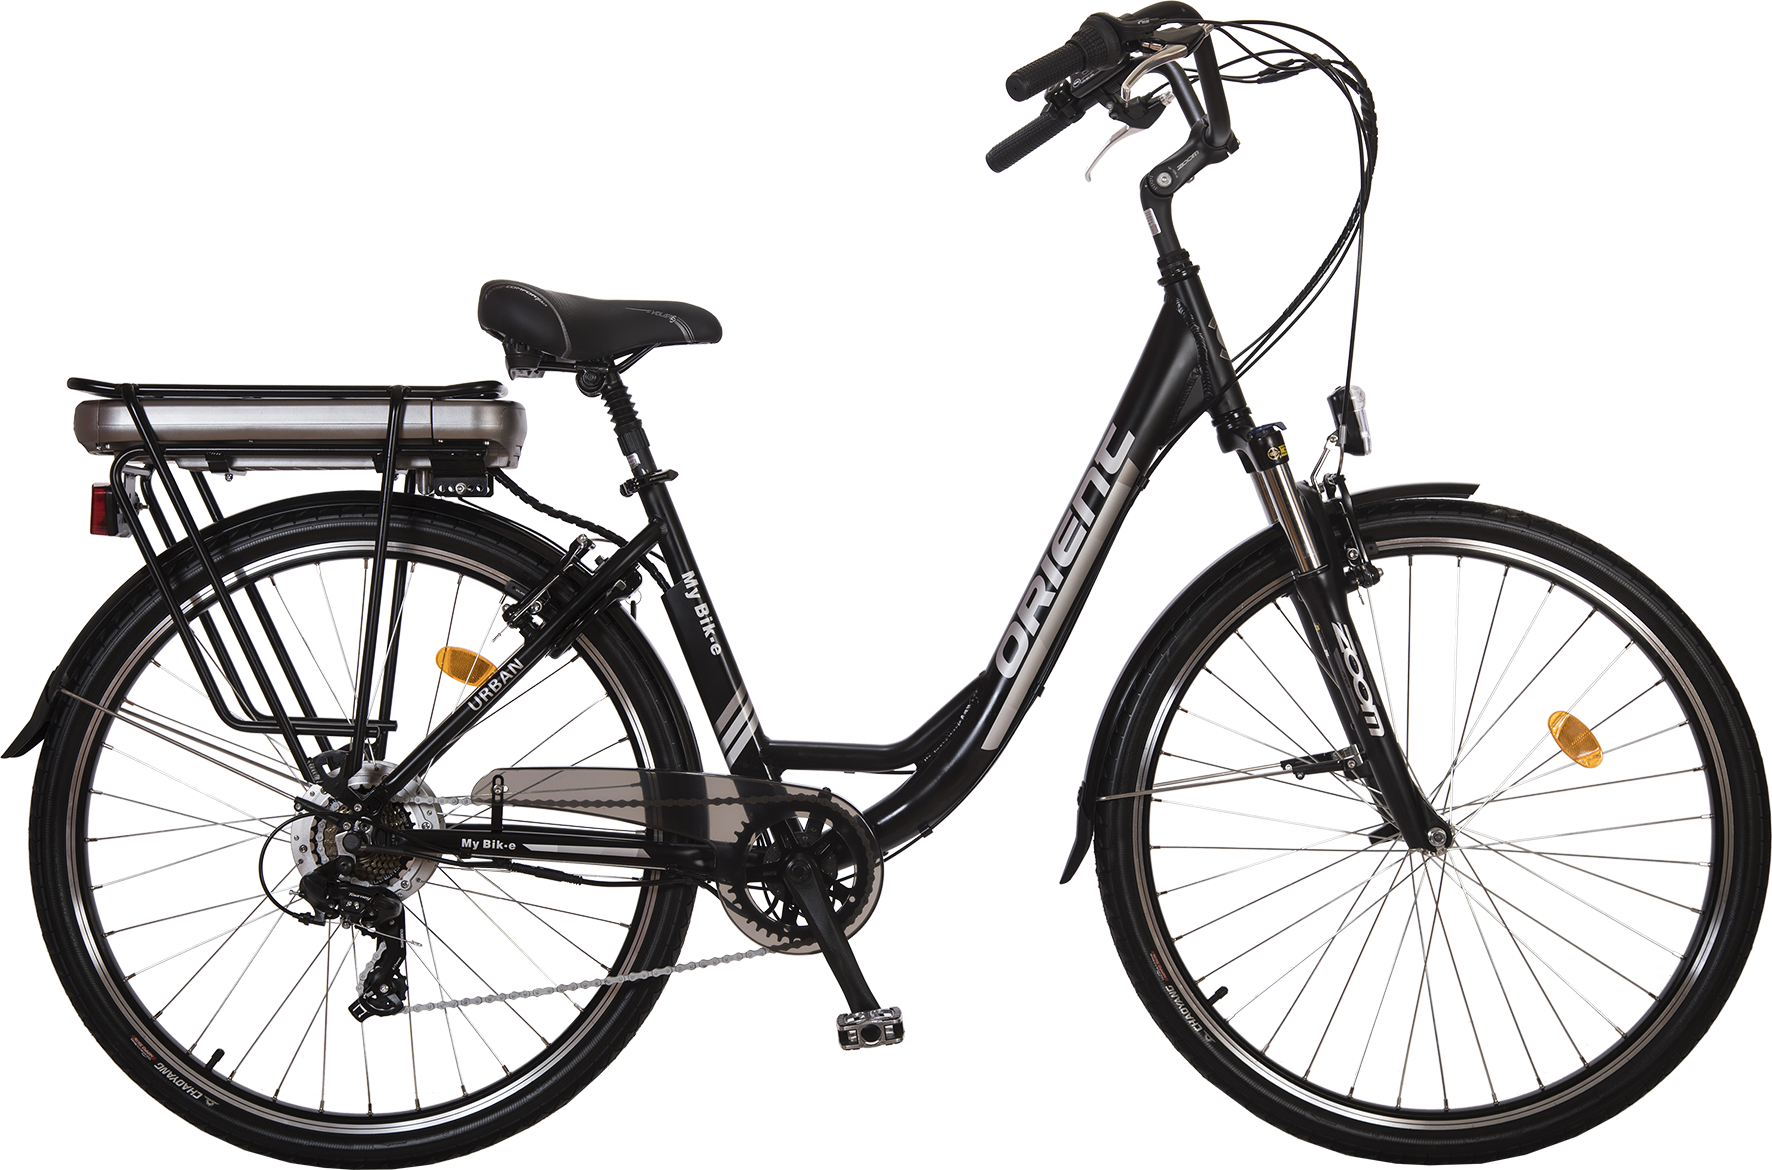 MY BIK-e 7sp. (rear motor) bike image